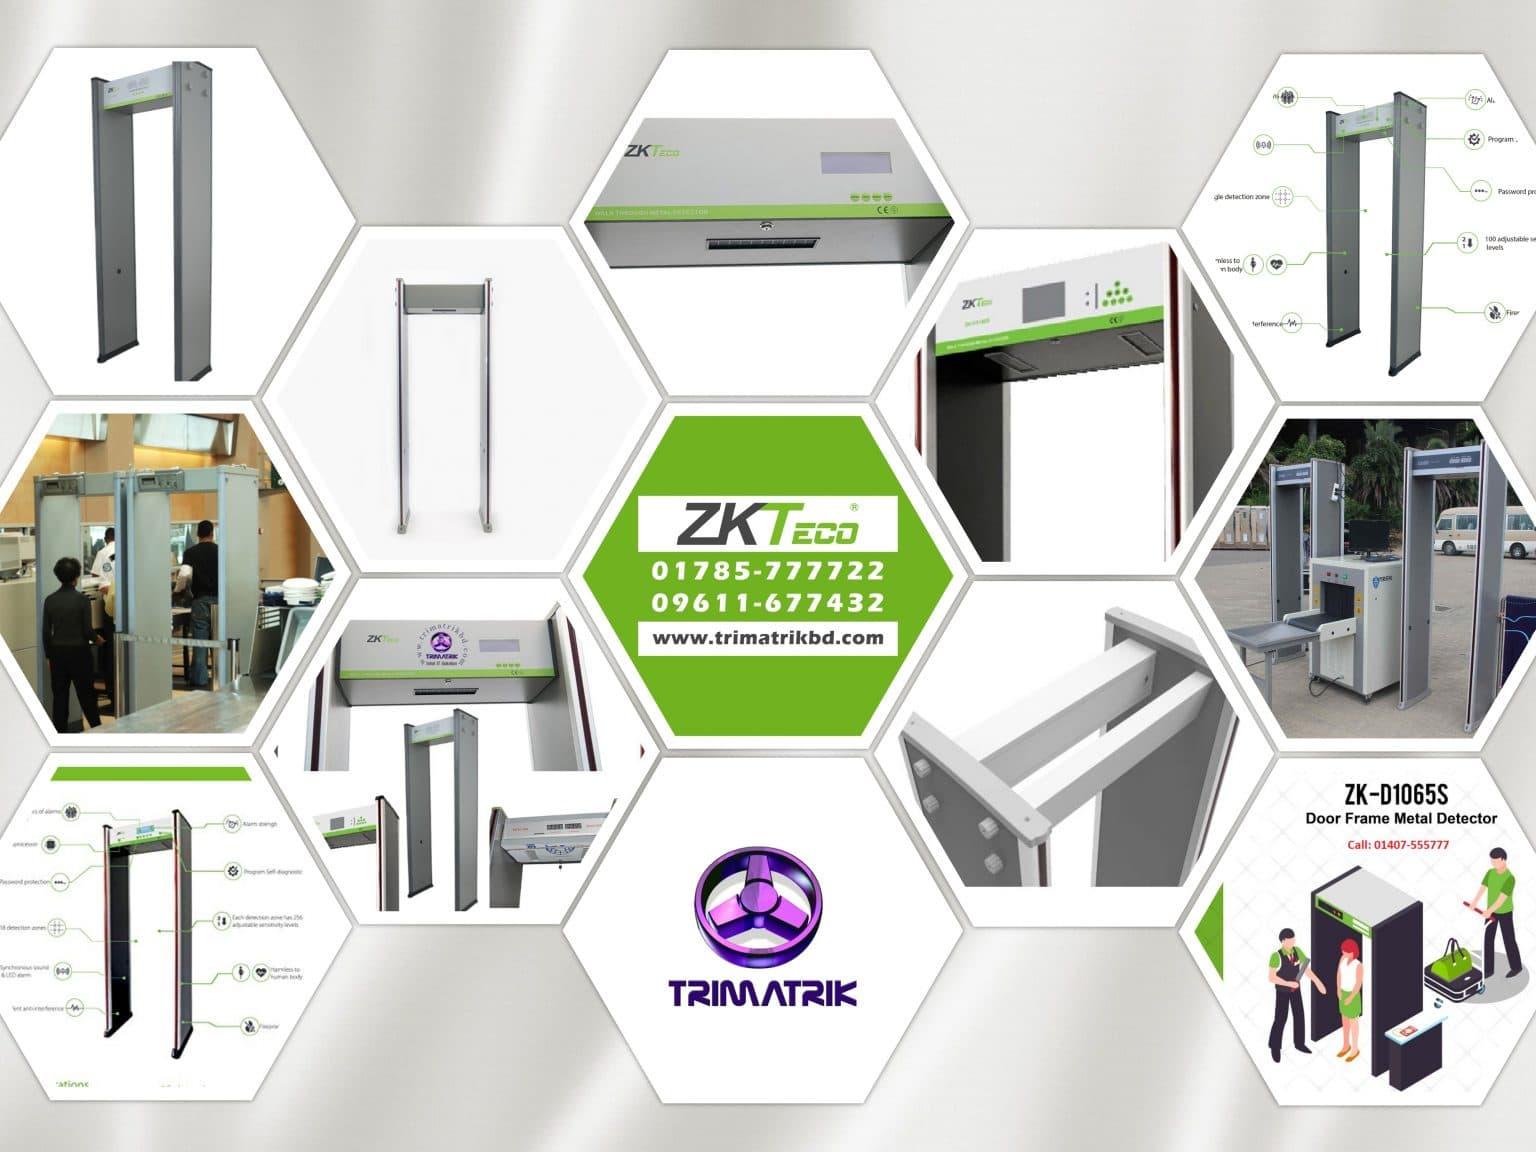 ZKTeco ZK-D1065S Price Bangladesh